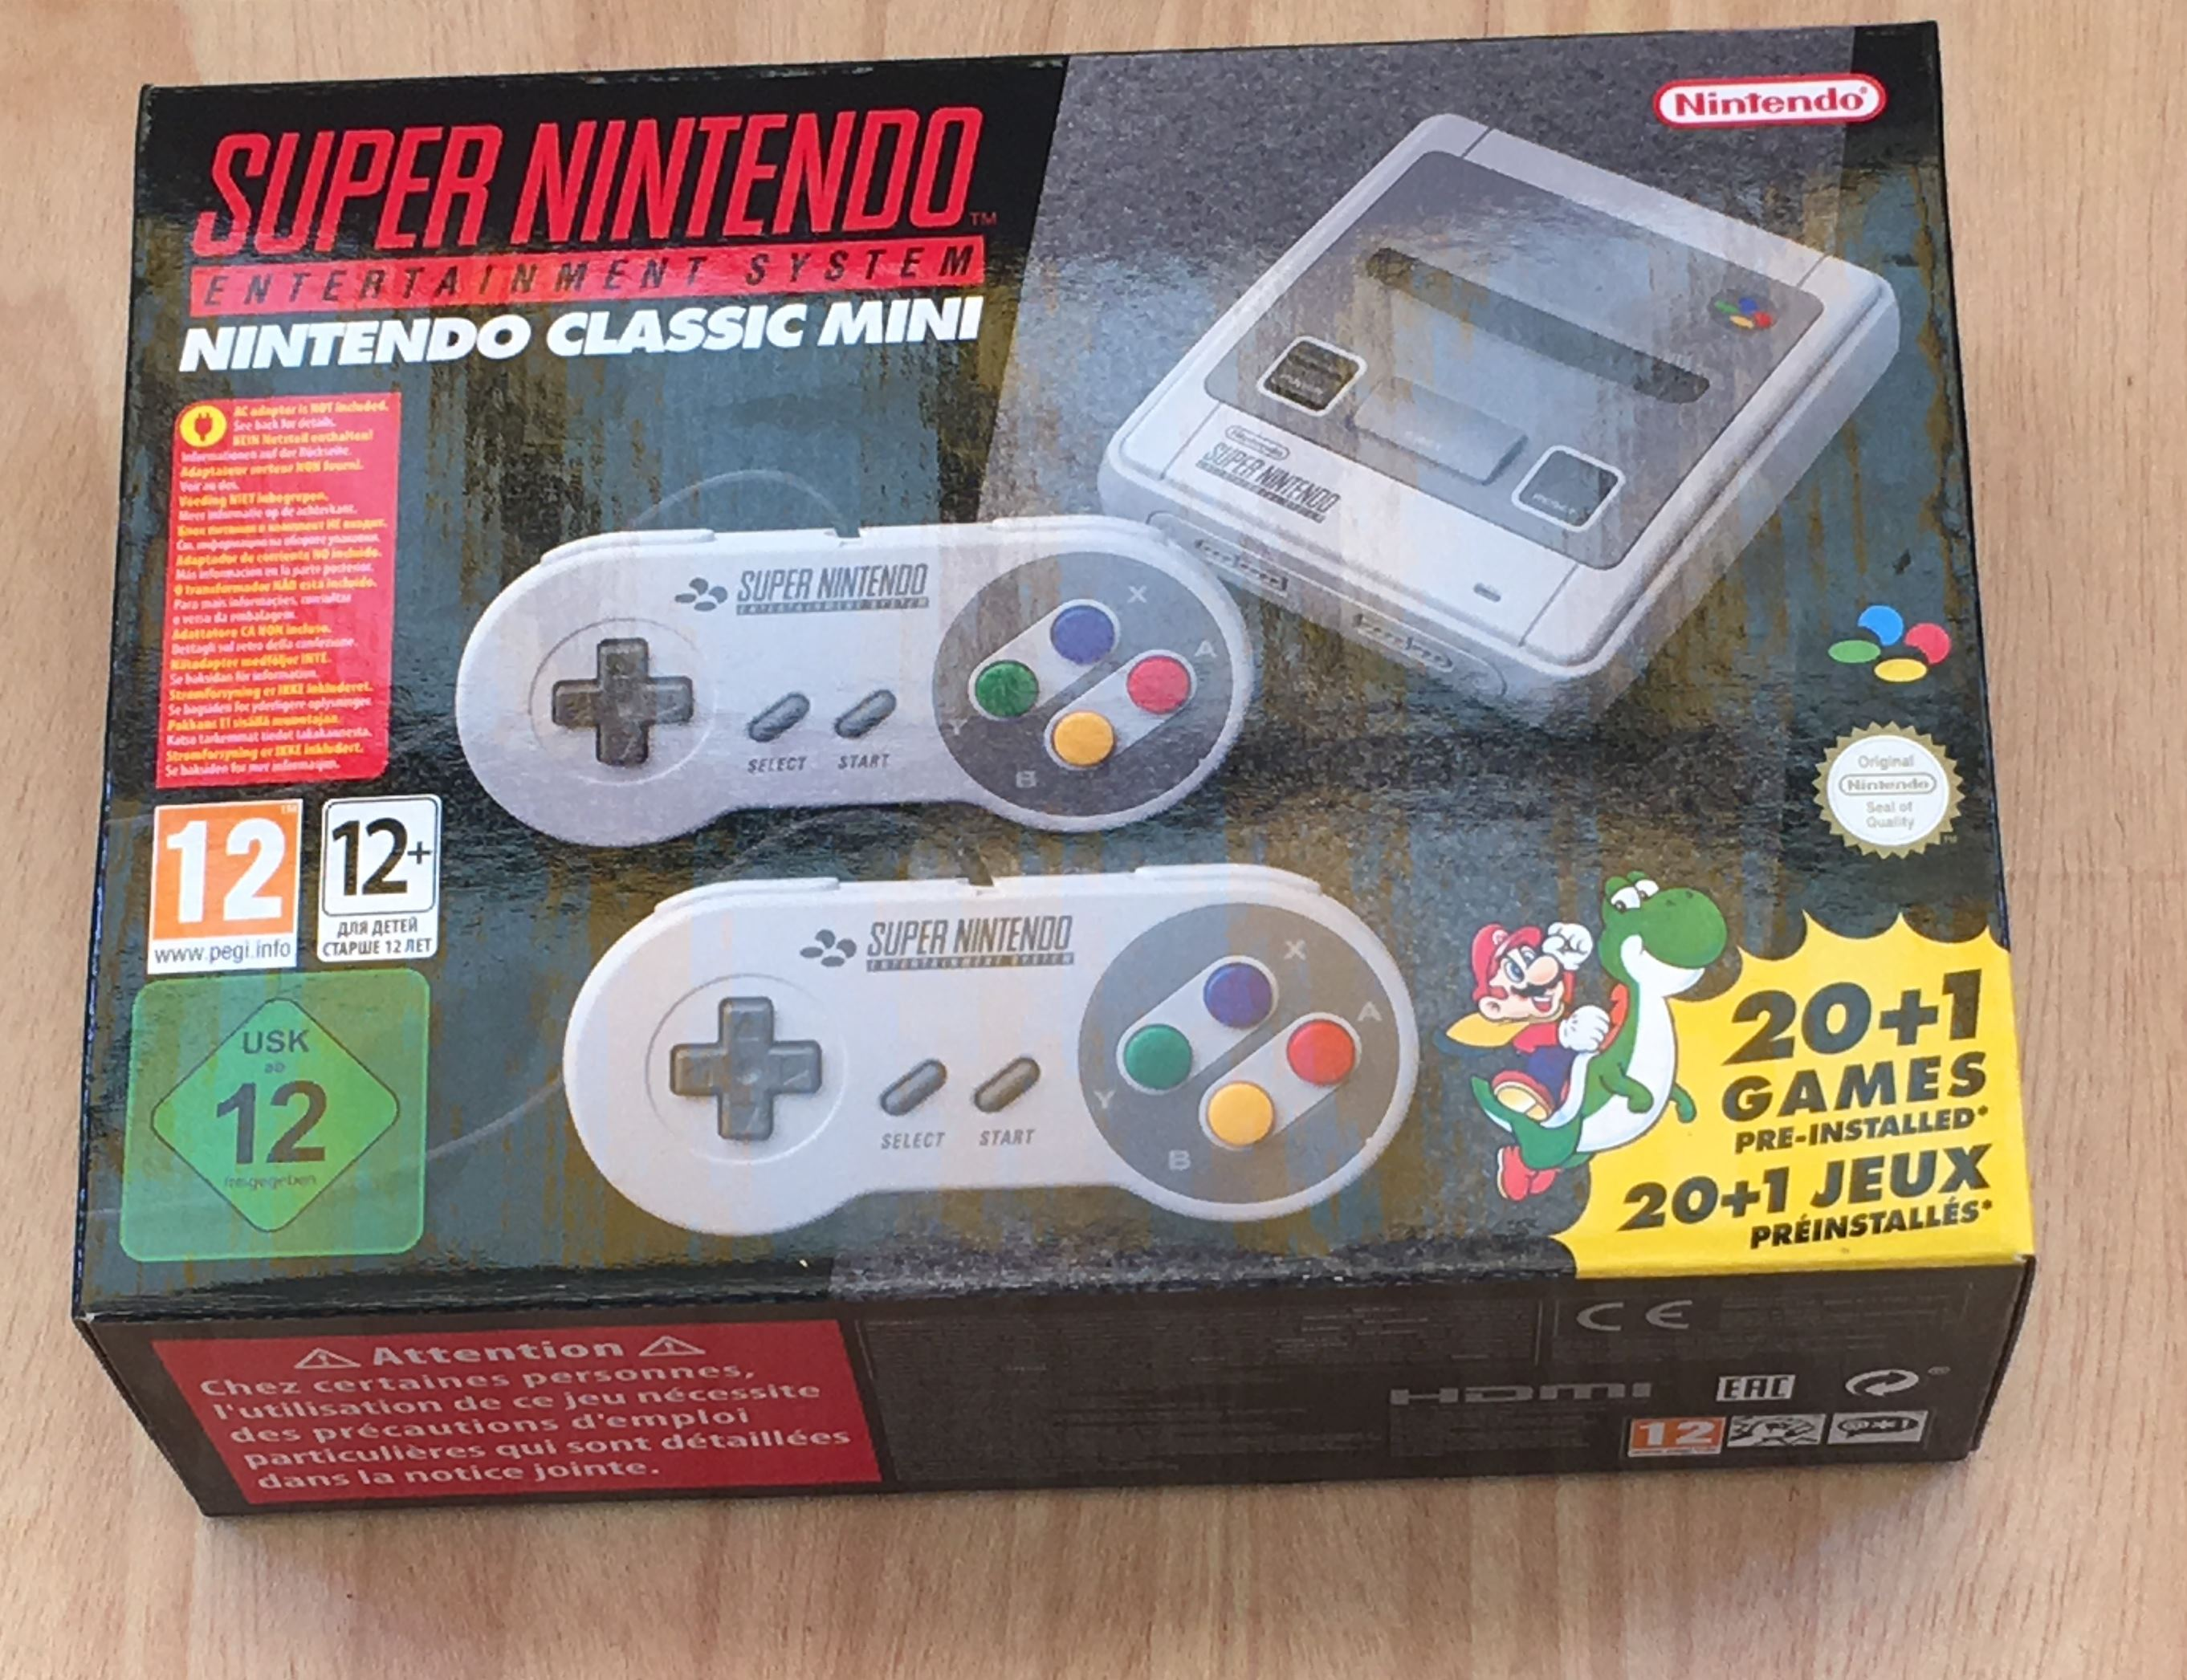 SNES Classic MinI — обзор новой «ретро» приставки от Nintendo - 1